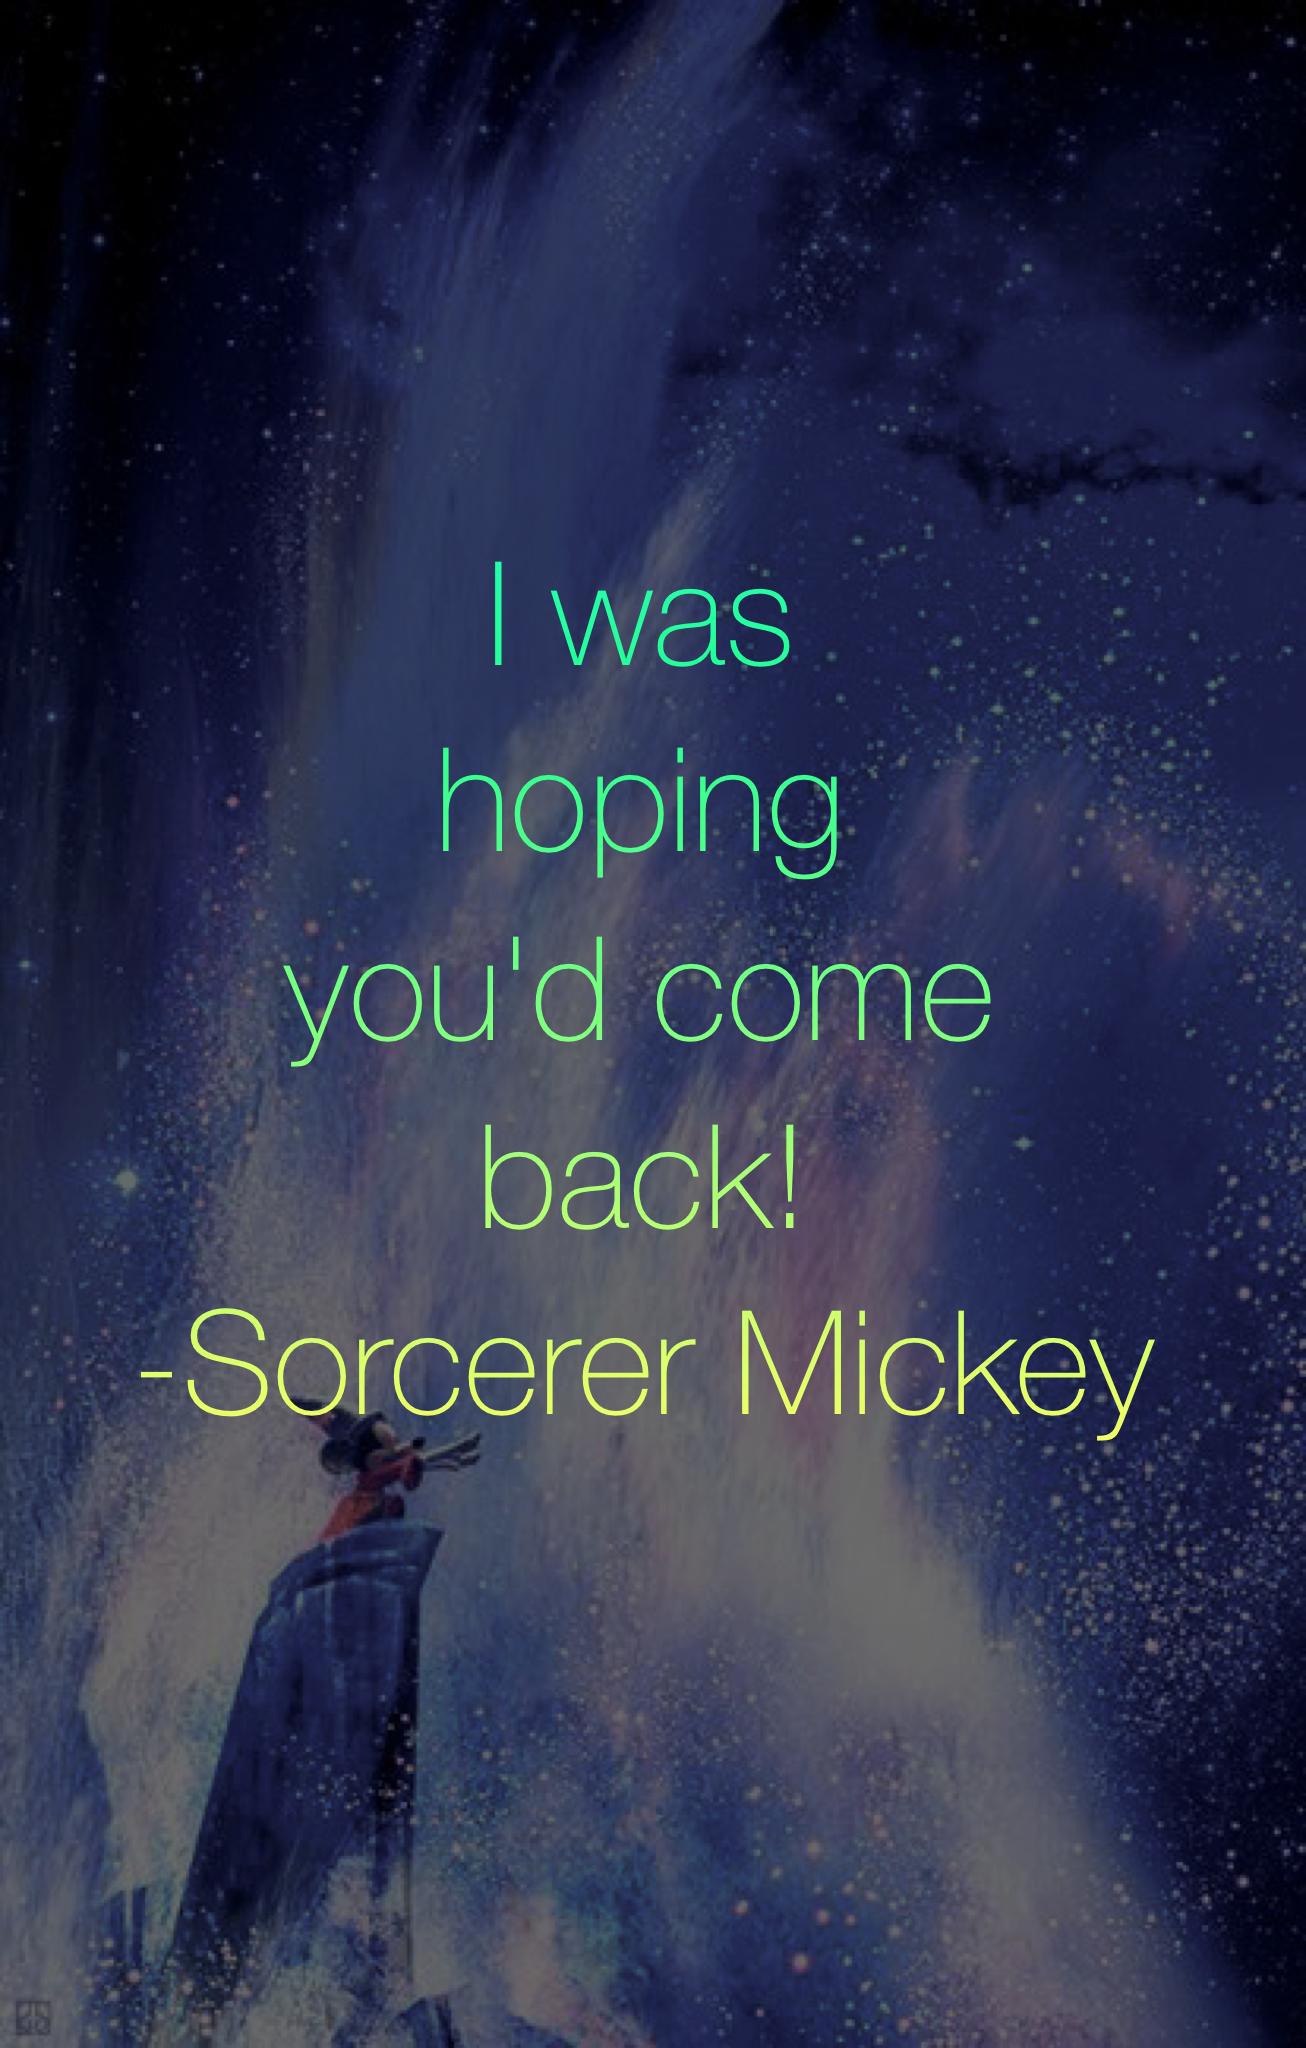 Disney Character Quote Sorcerer Mickey Disney Pinterest